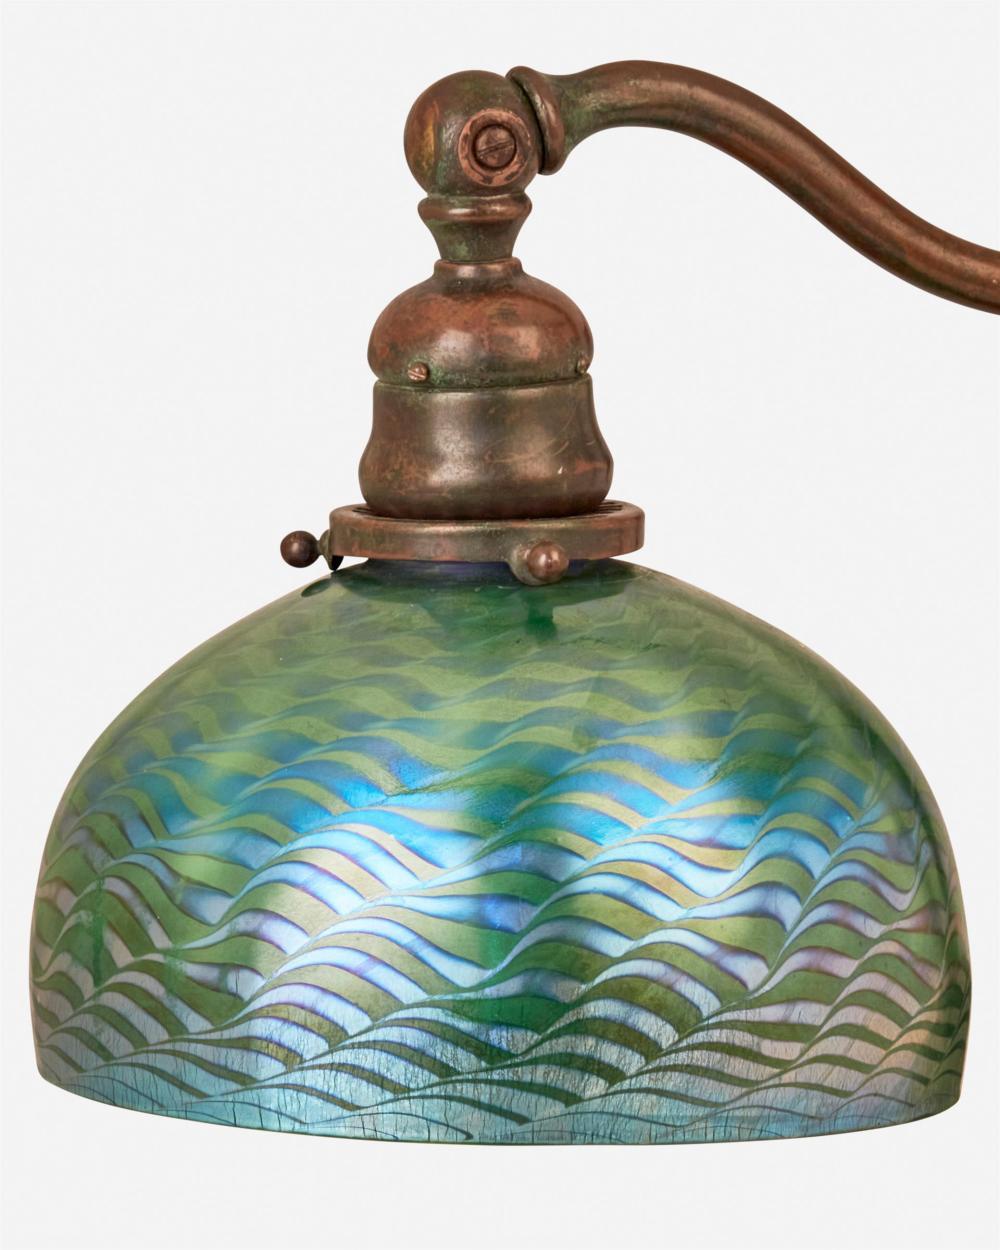 A Tiffany Studios counter-balance desk lamp